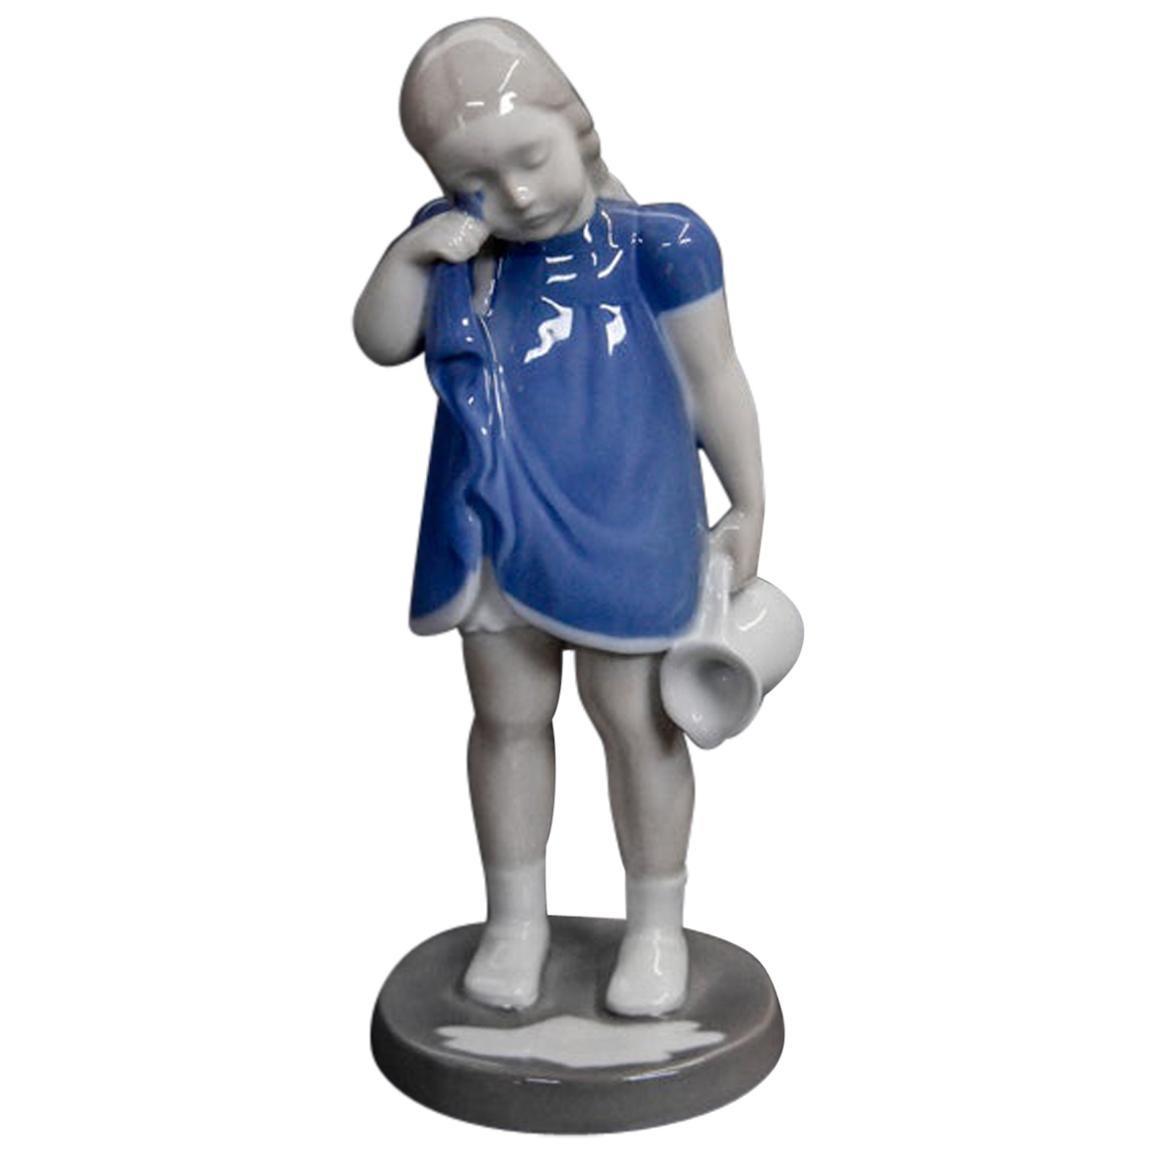 Porcelain Figurine Bing & Grøndahl